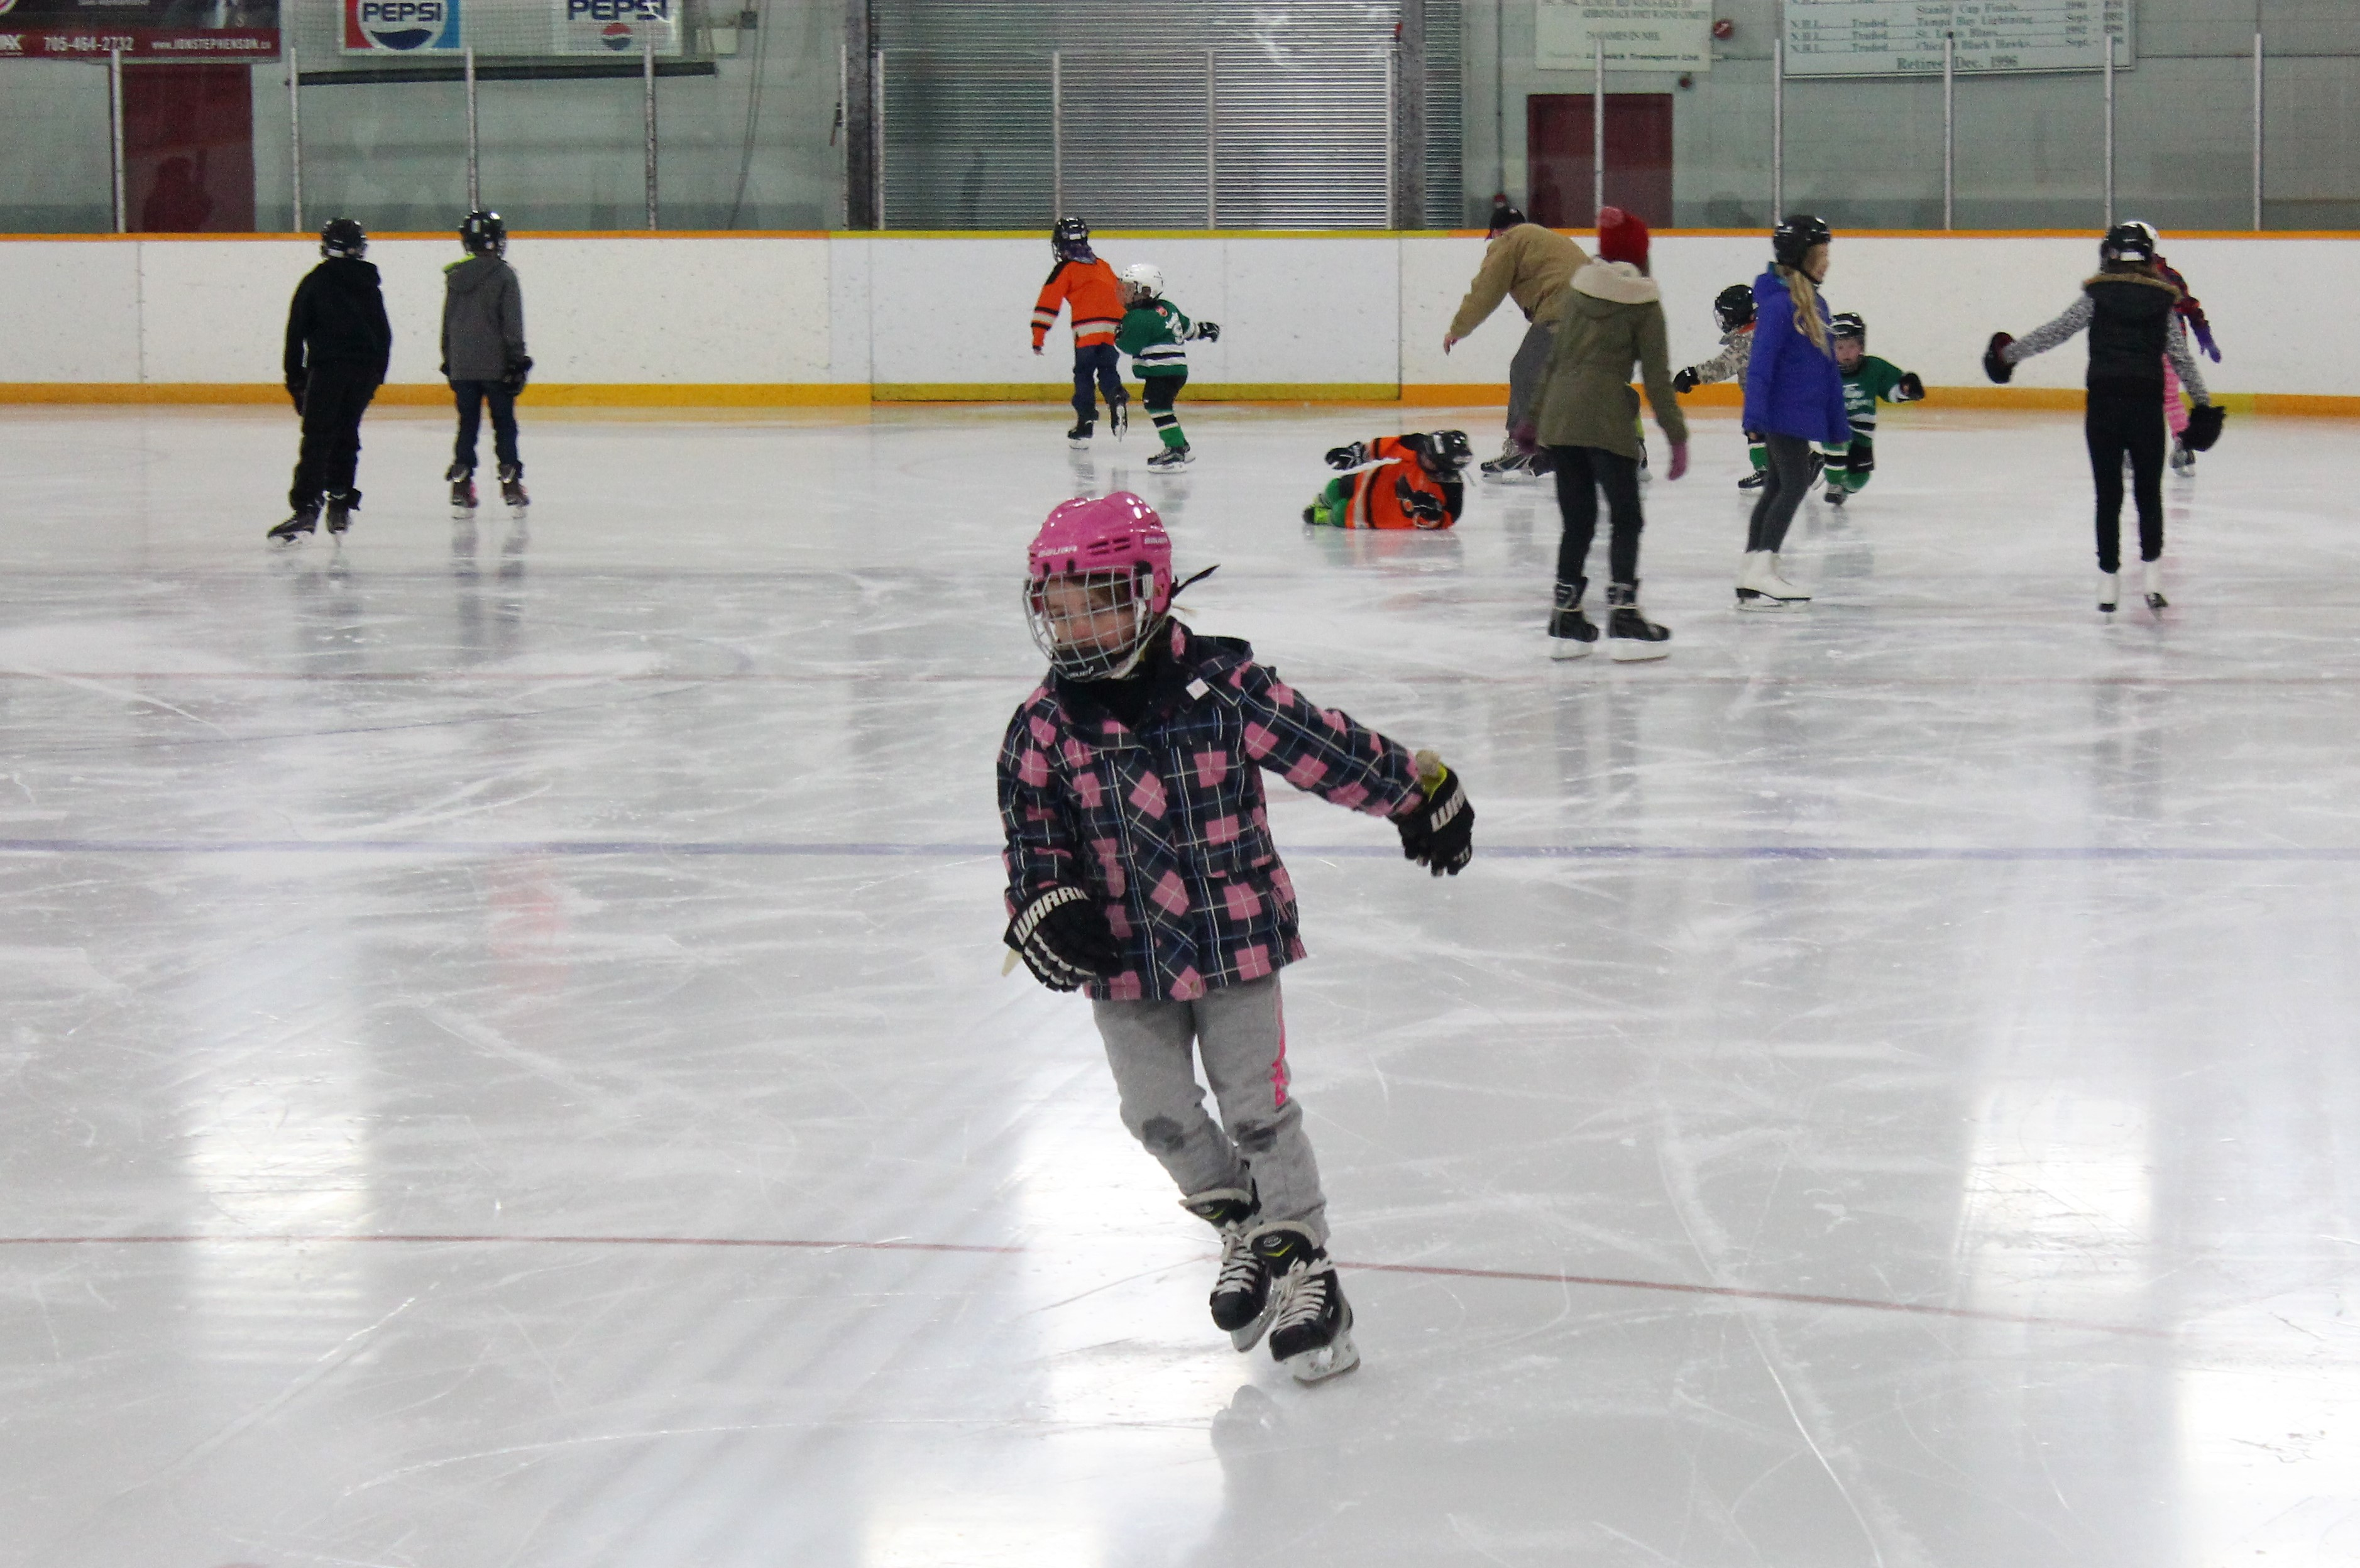 Free public skating returns to Brock arenas this holiday season